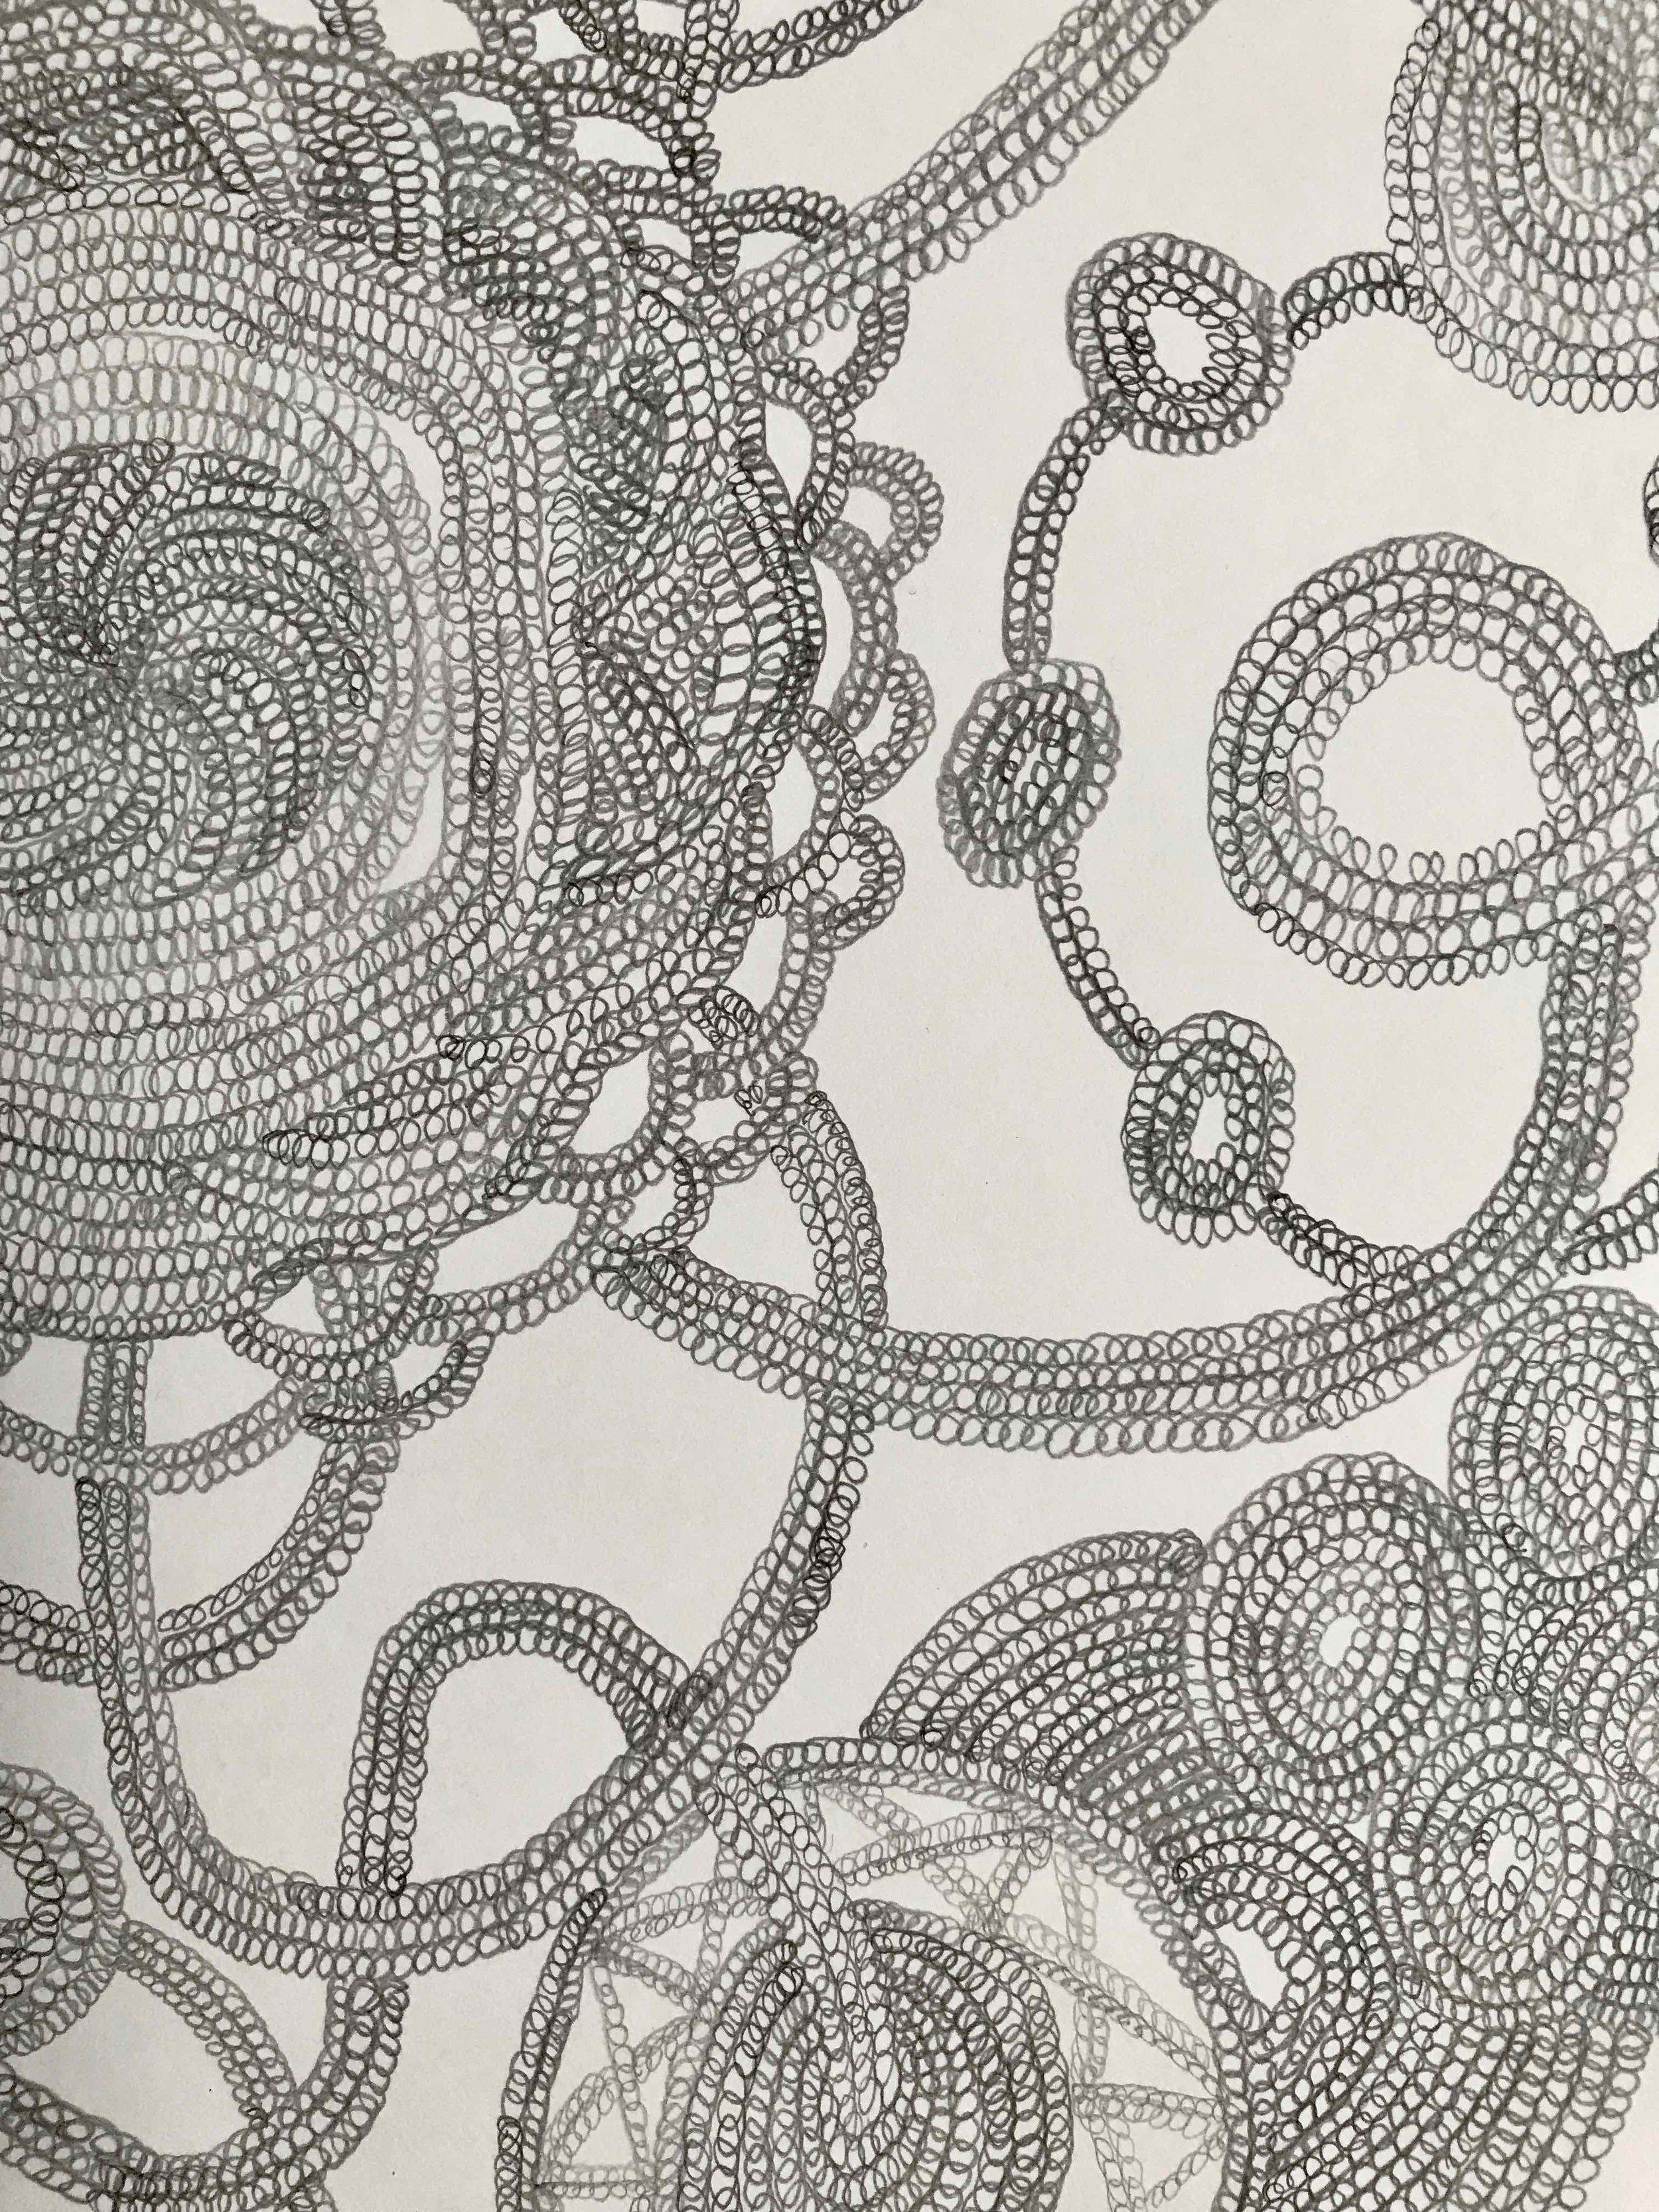 Turtegning, detalj  42x29,7cm blyant på papir 2015